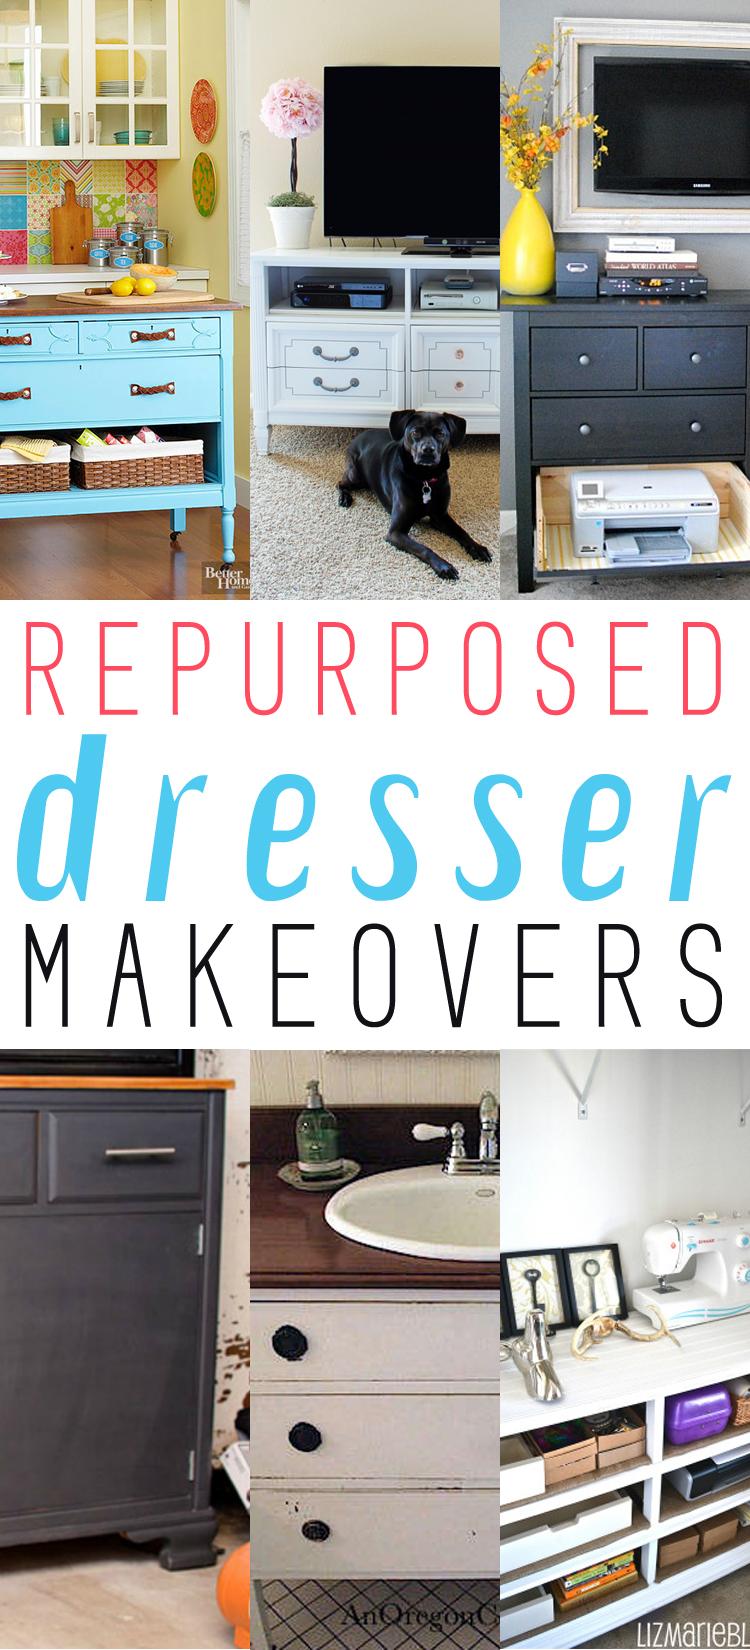 RepurposedDresser-TOWER-001